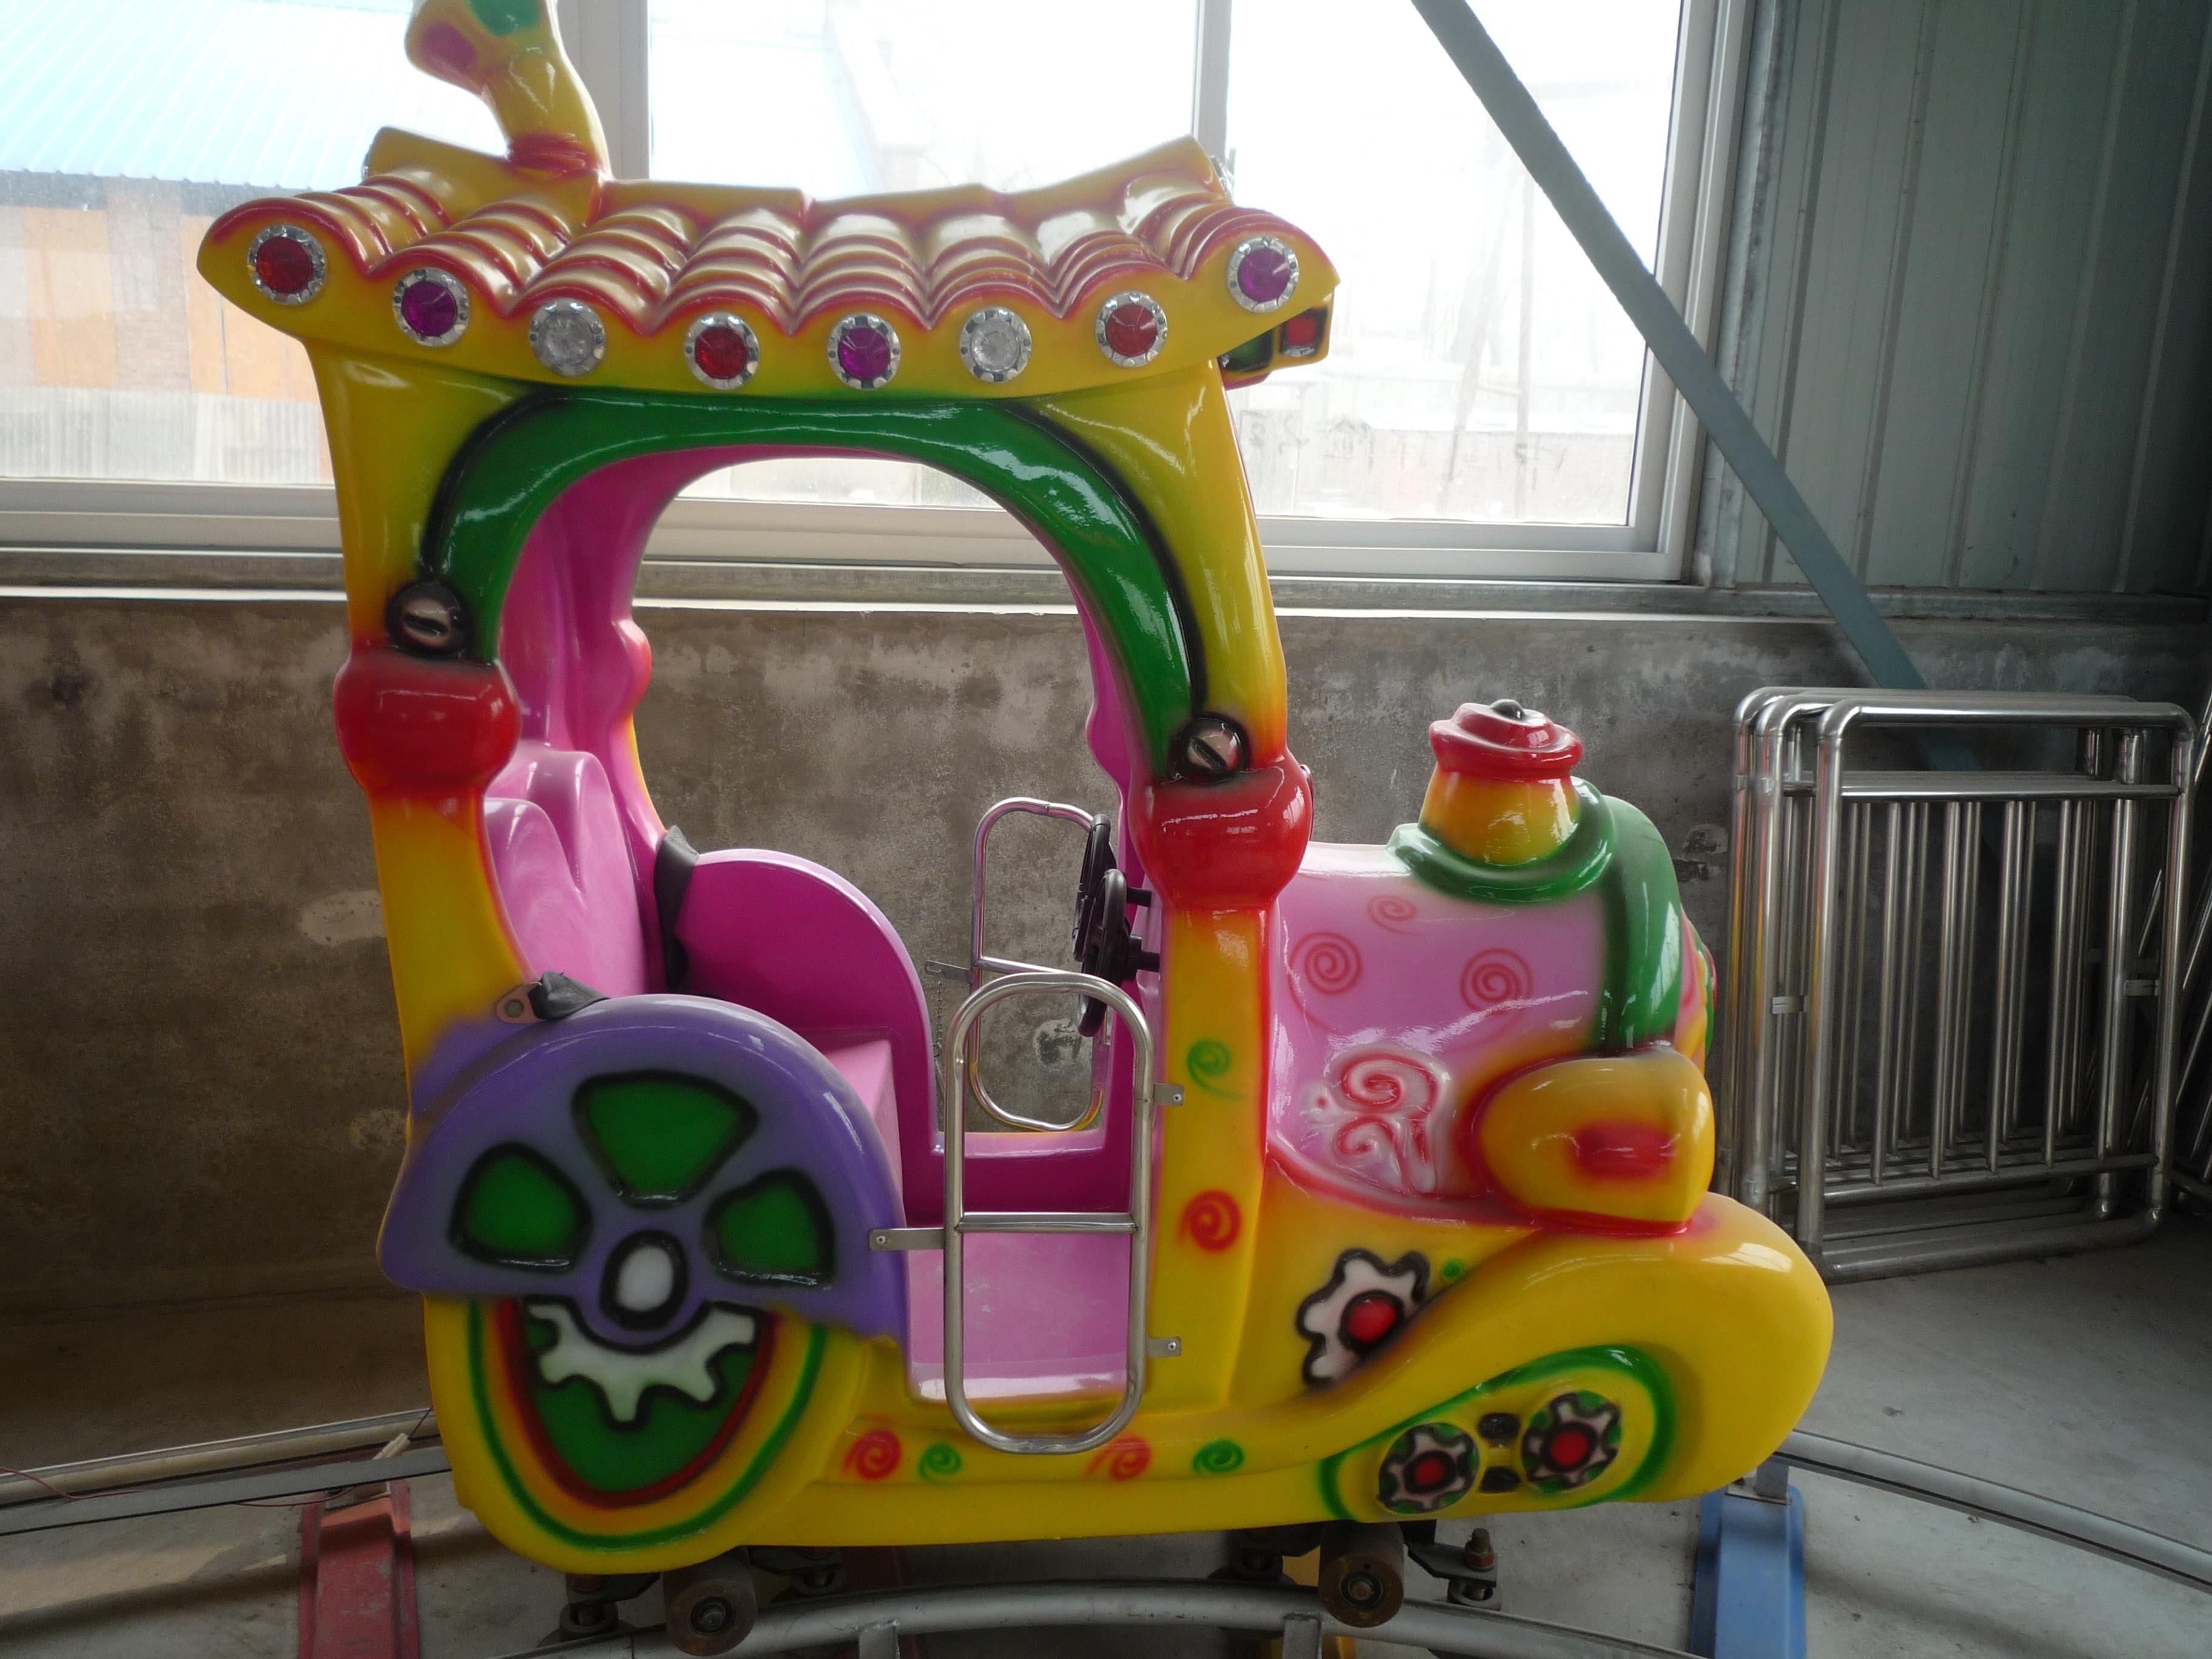 china promotion toy train, china promotion toy train